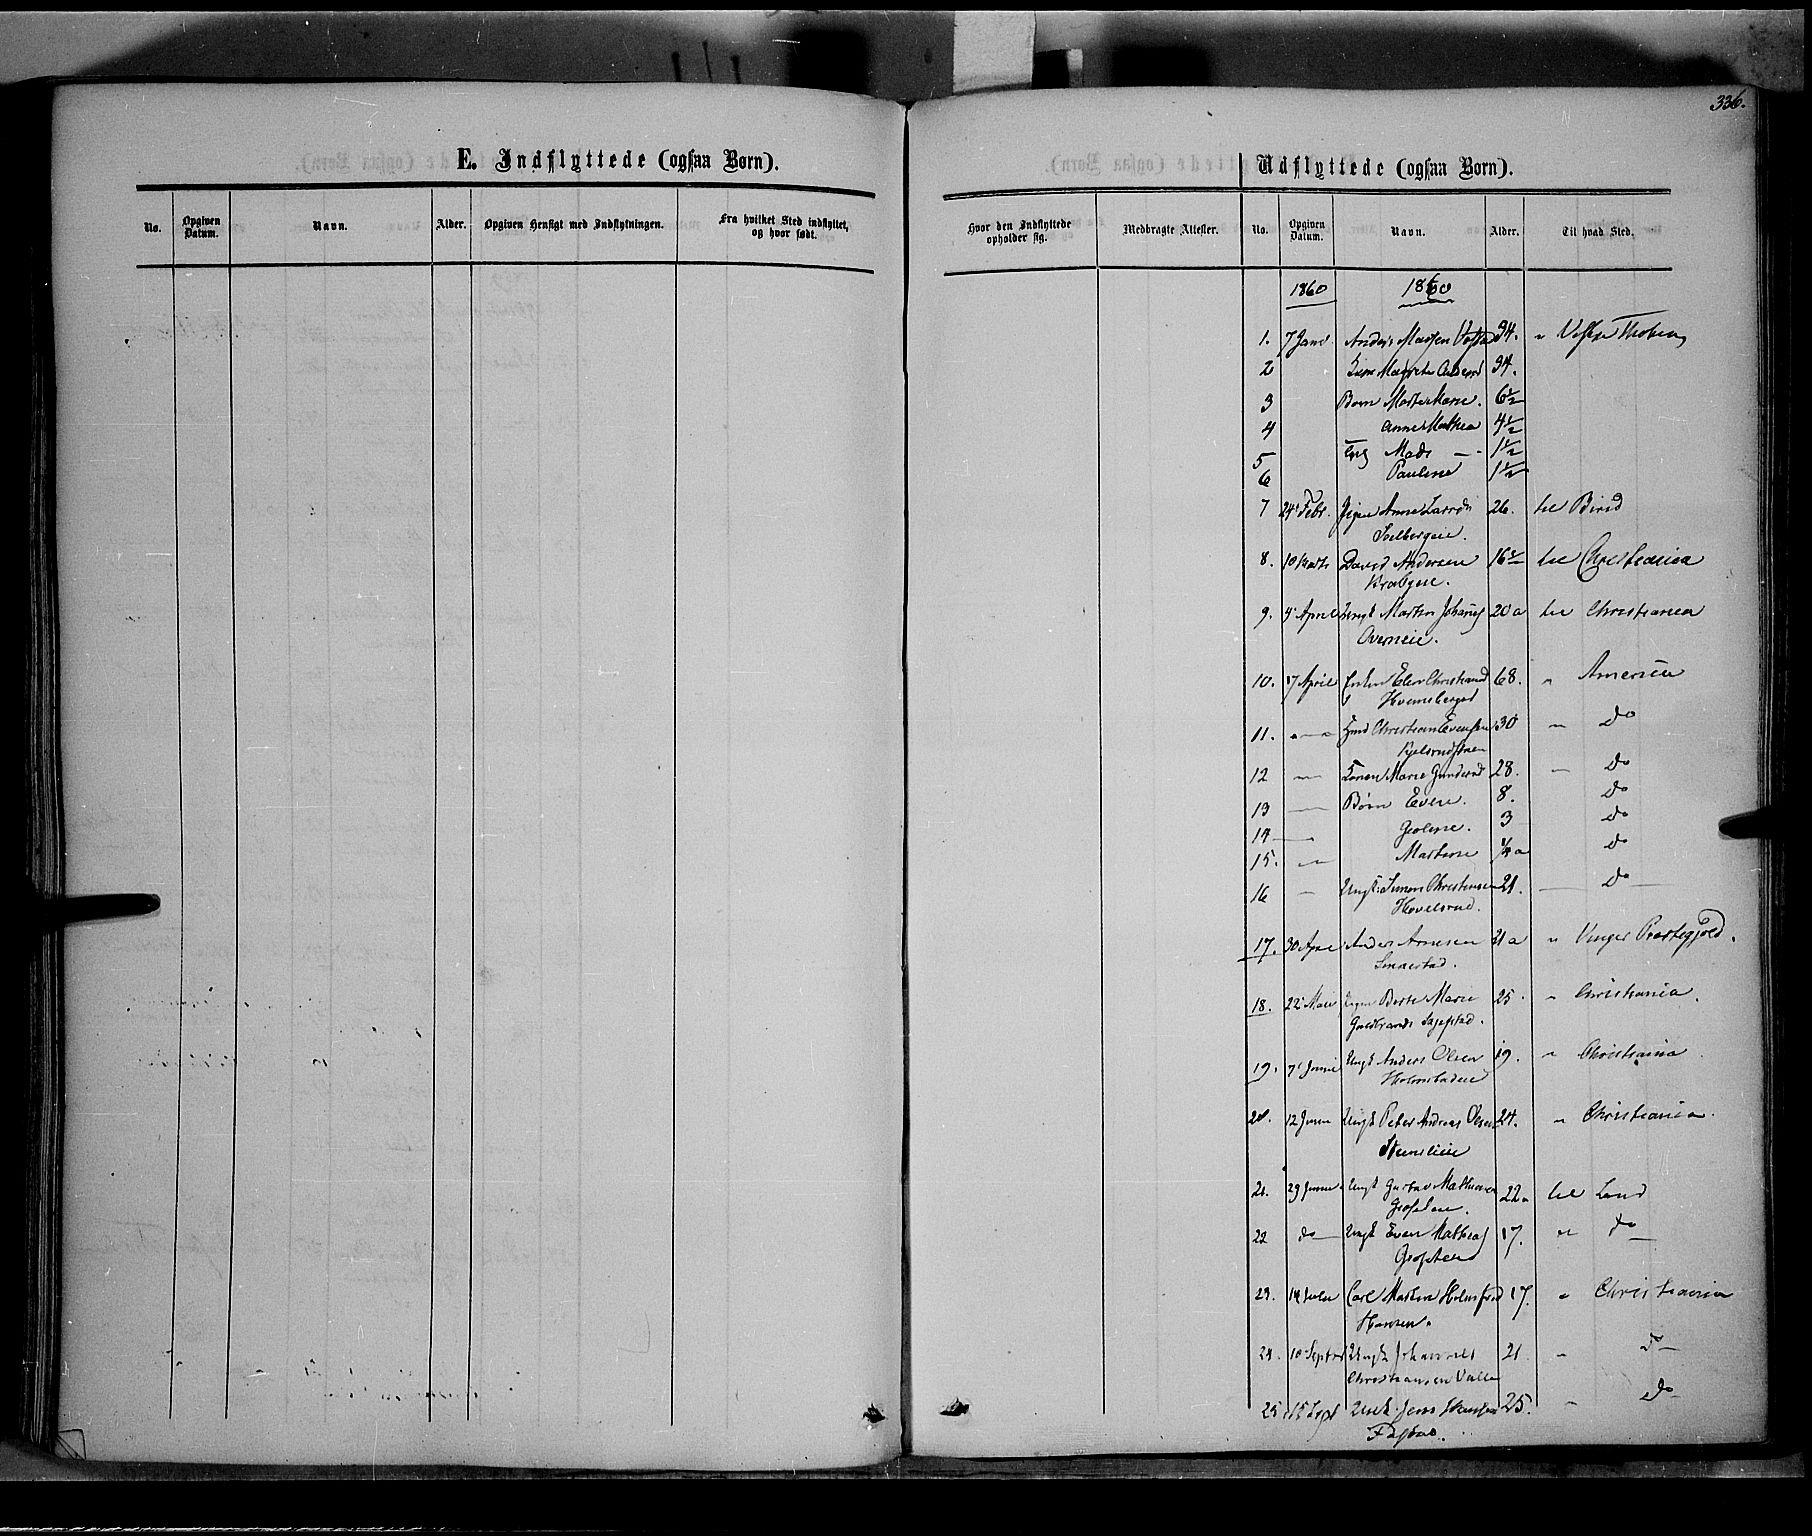 SAH, Østre Toten prestekontor, Ministerialbok nr. 4, 1857-1865, s. 336